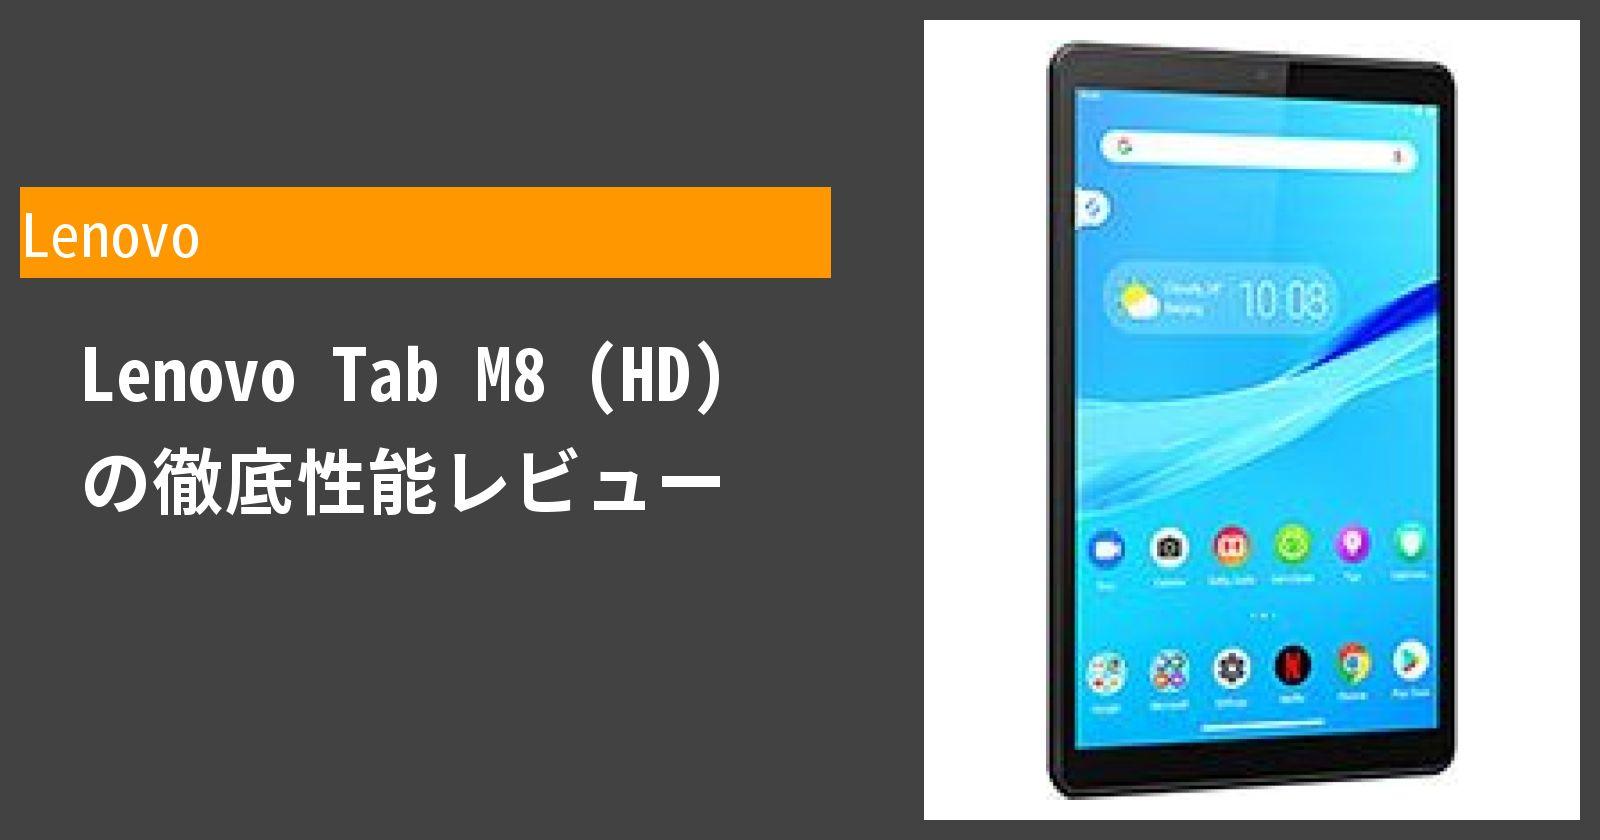 Lenovo Tab M8 (HD) の徹底性能レビュー